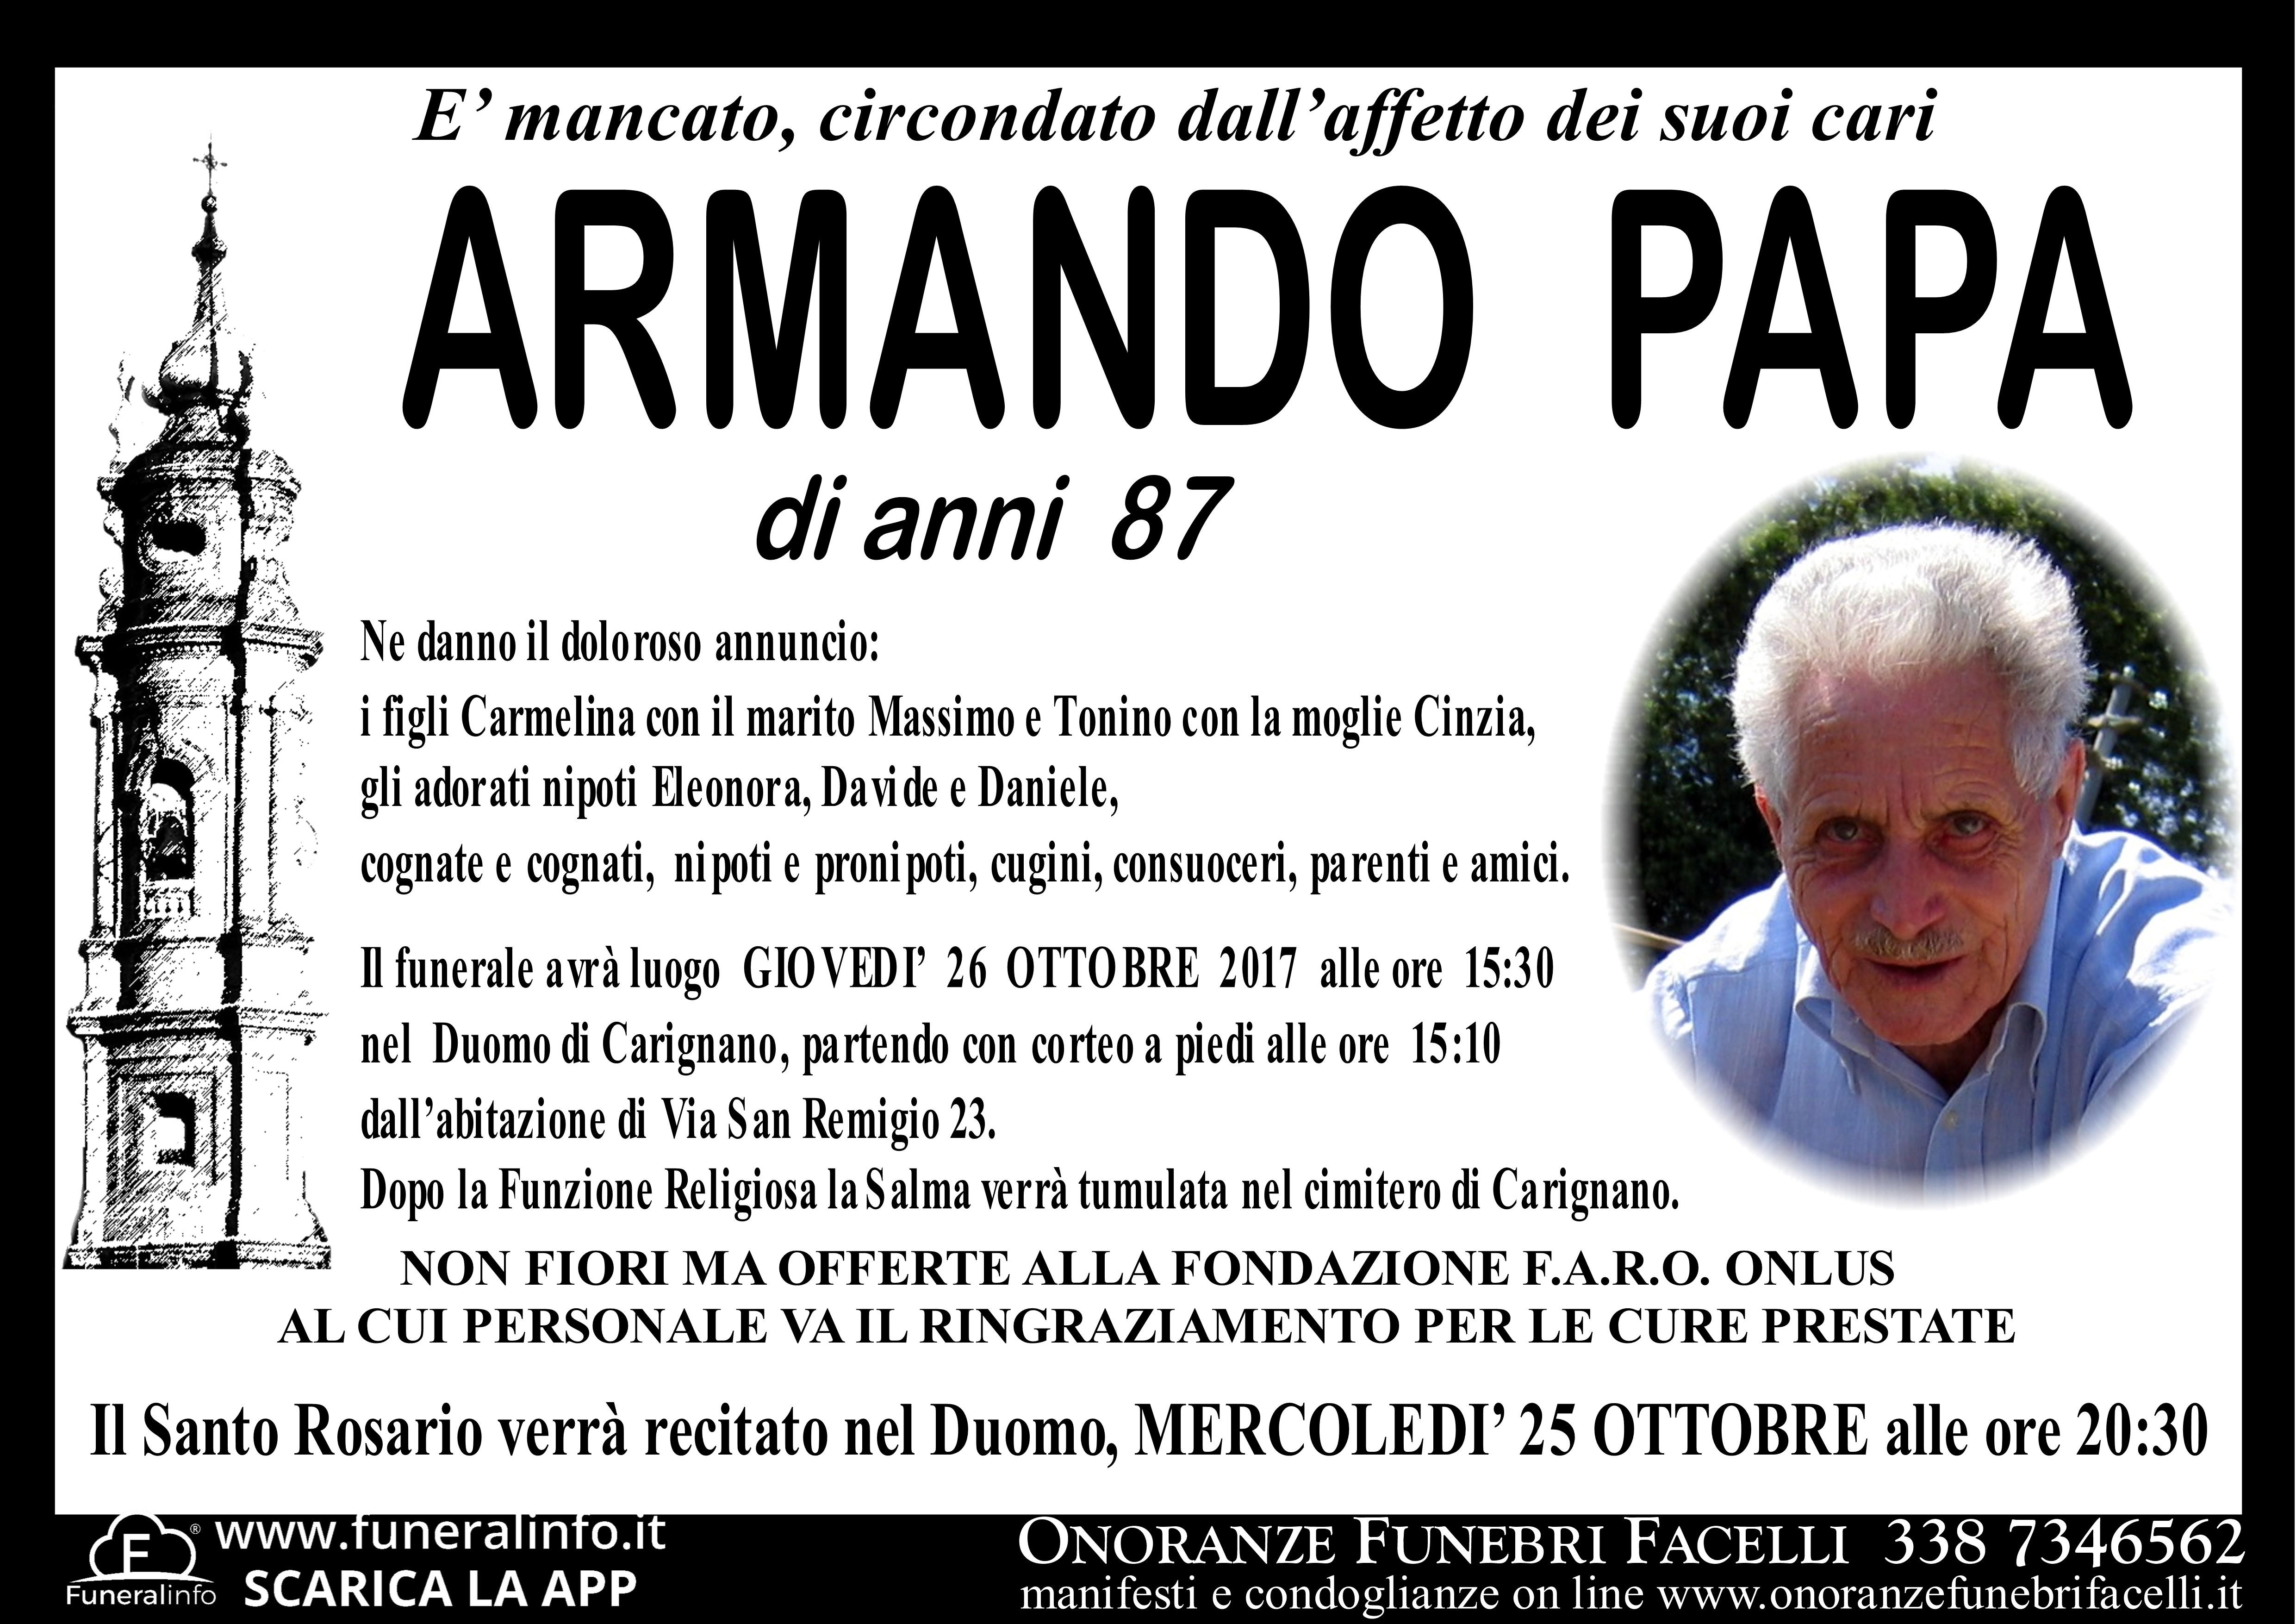 Famoso PAPA ARMANDO - Onoranze Funebri Facelli YK17